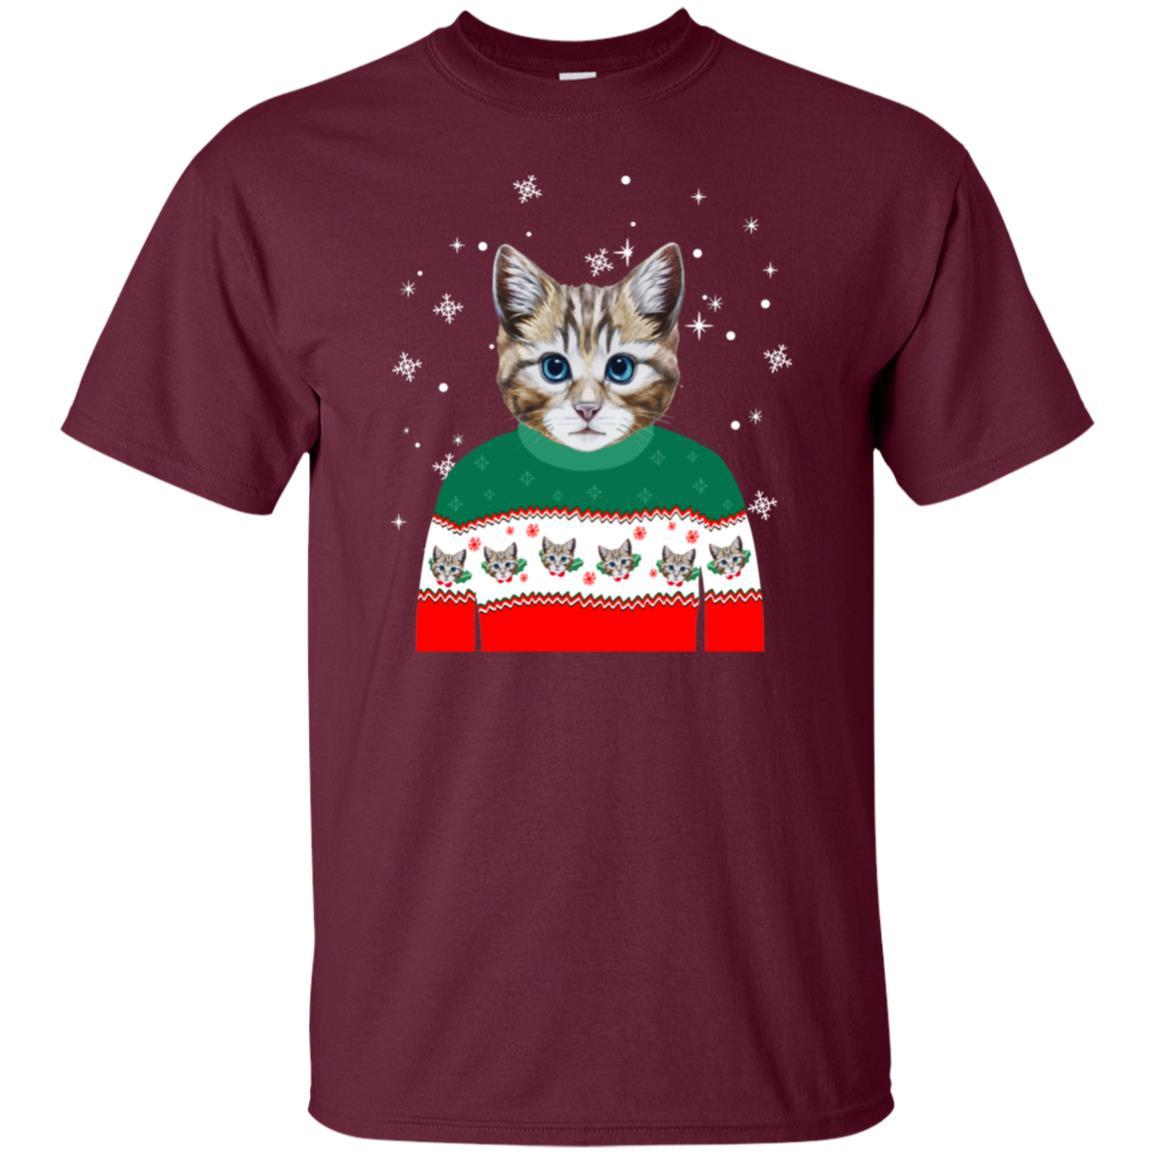 Funny Cat Wearing Ugly Christmas Sweater X-Mas Unisex Short Sleeve